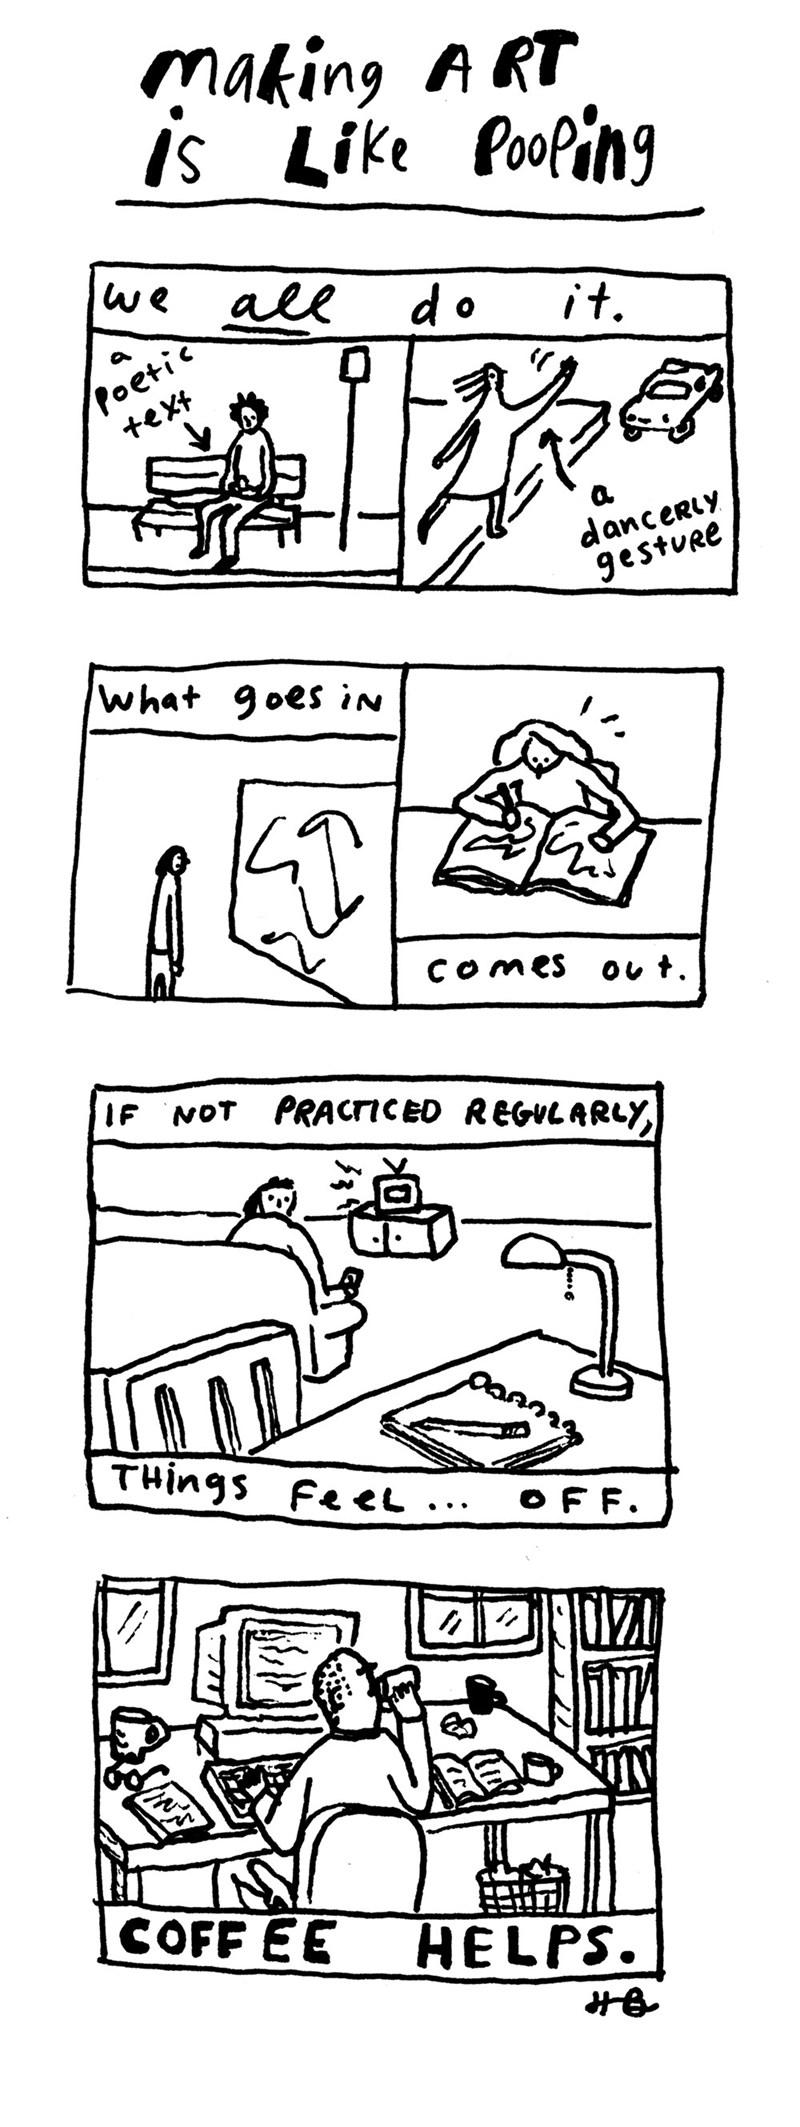 funny-web-comics-making-art-is-like-pooping